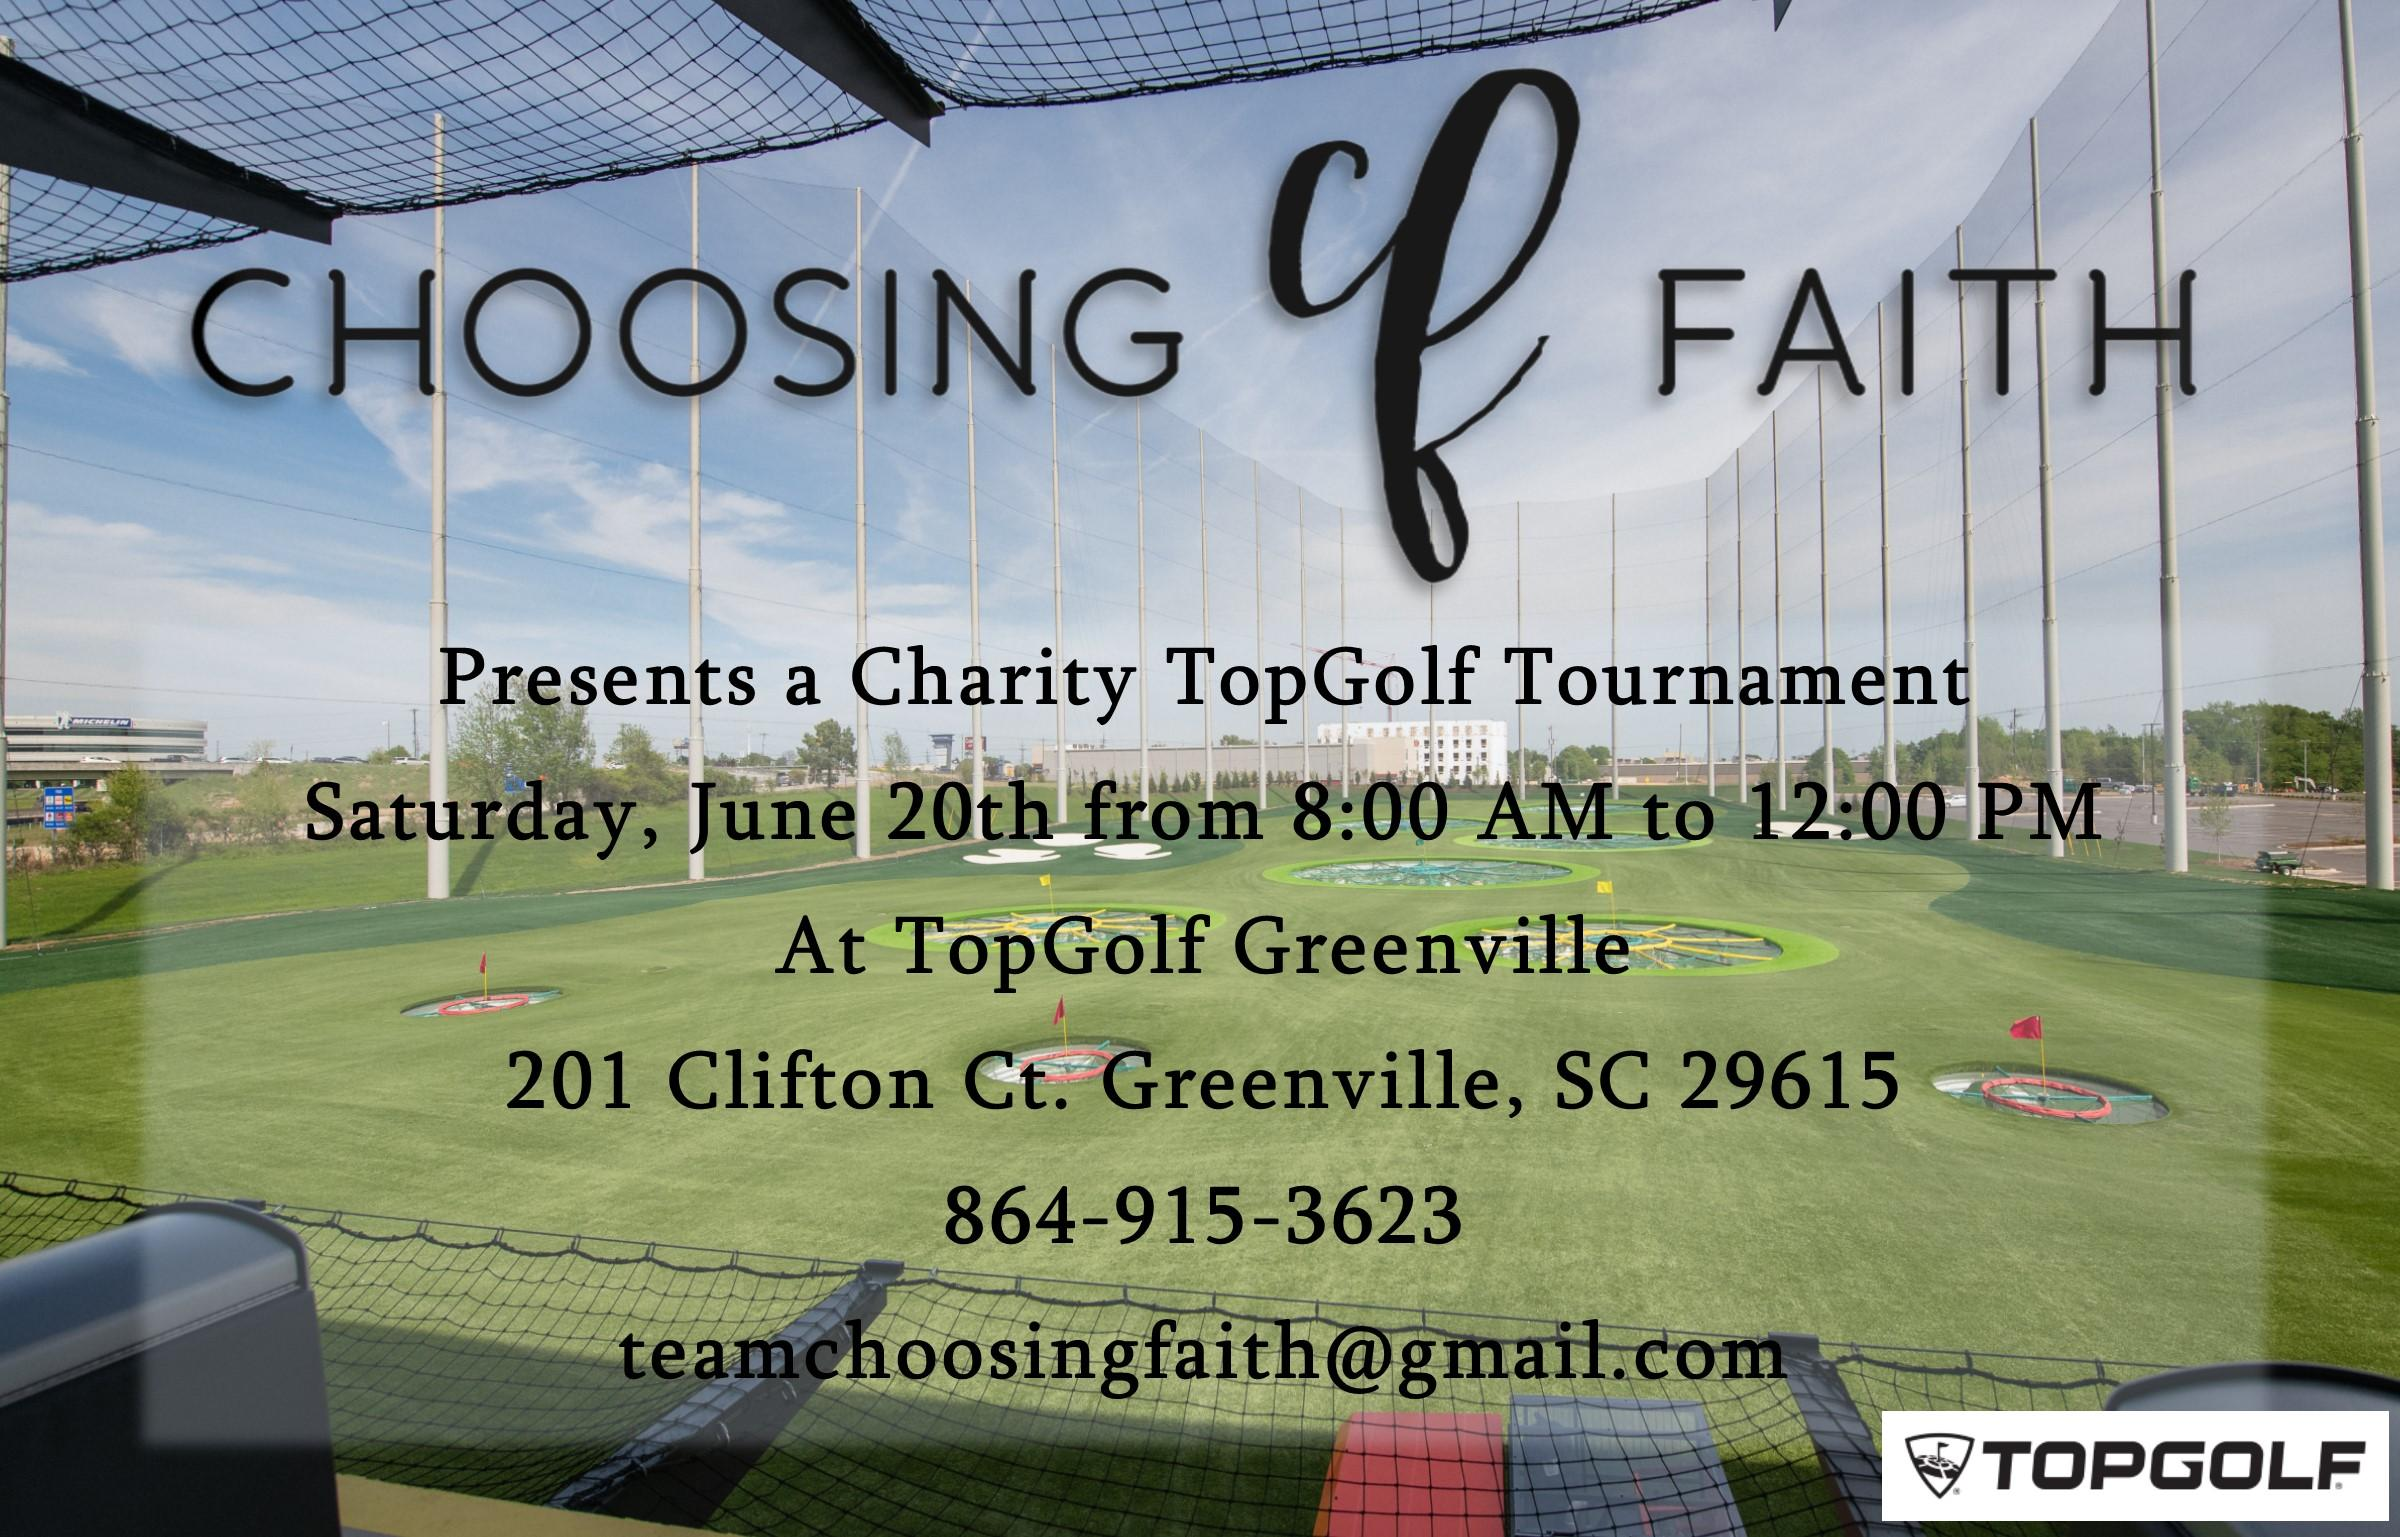 Choosing Faith Foundation TopGolf Charity Tournament